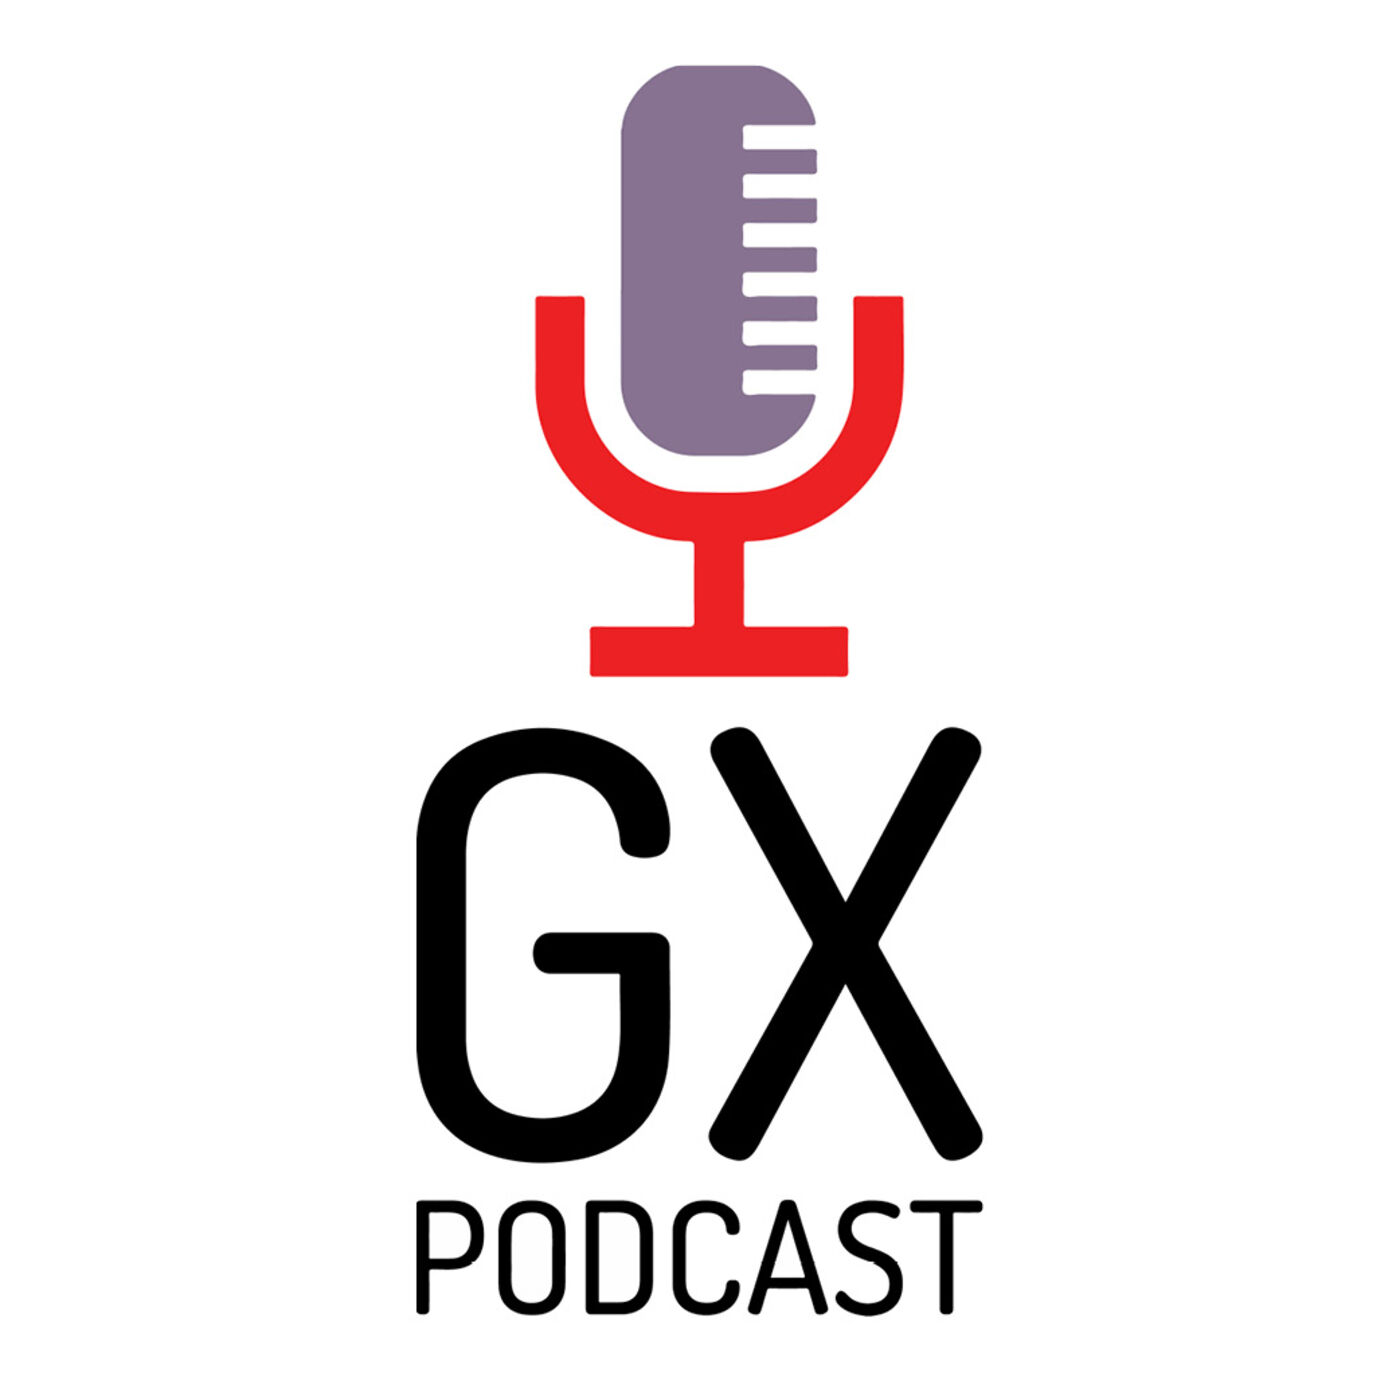 GX Podcast podcast show image